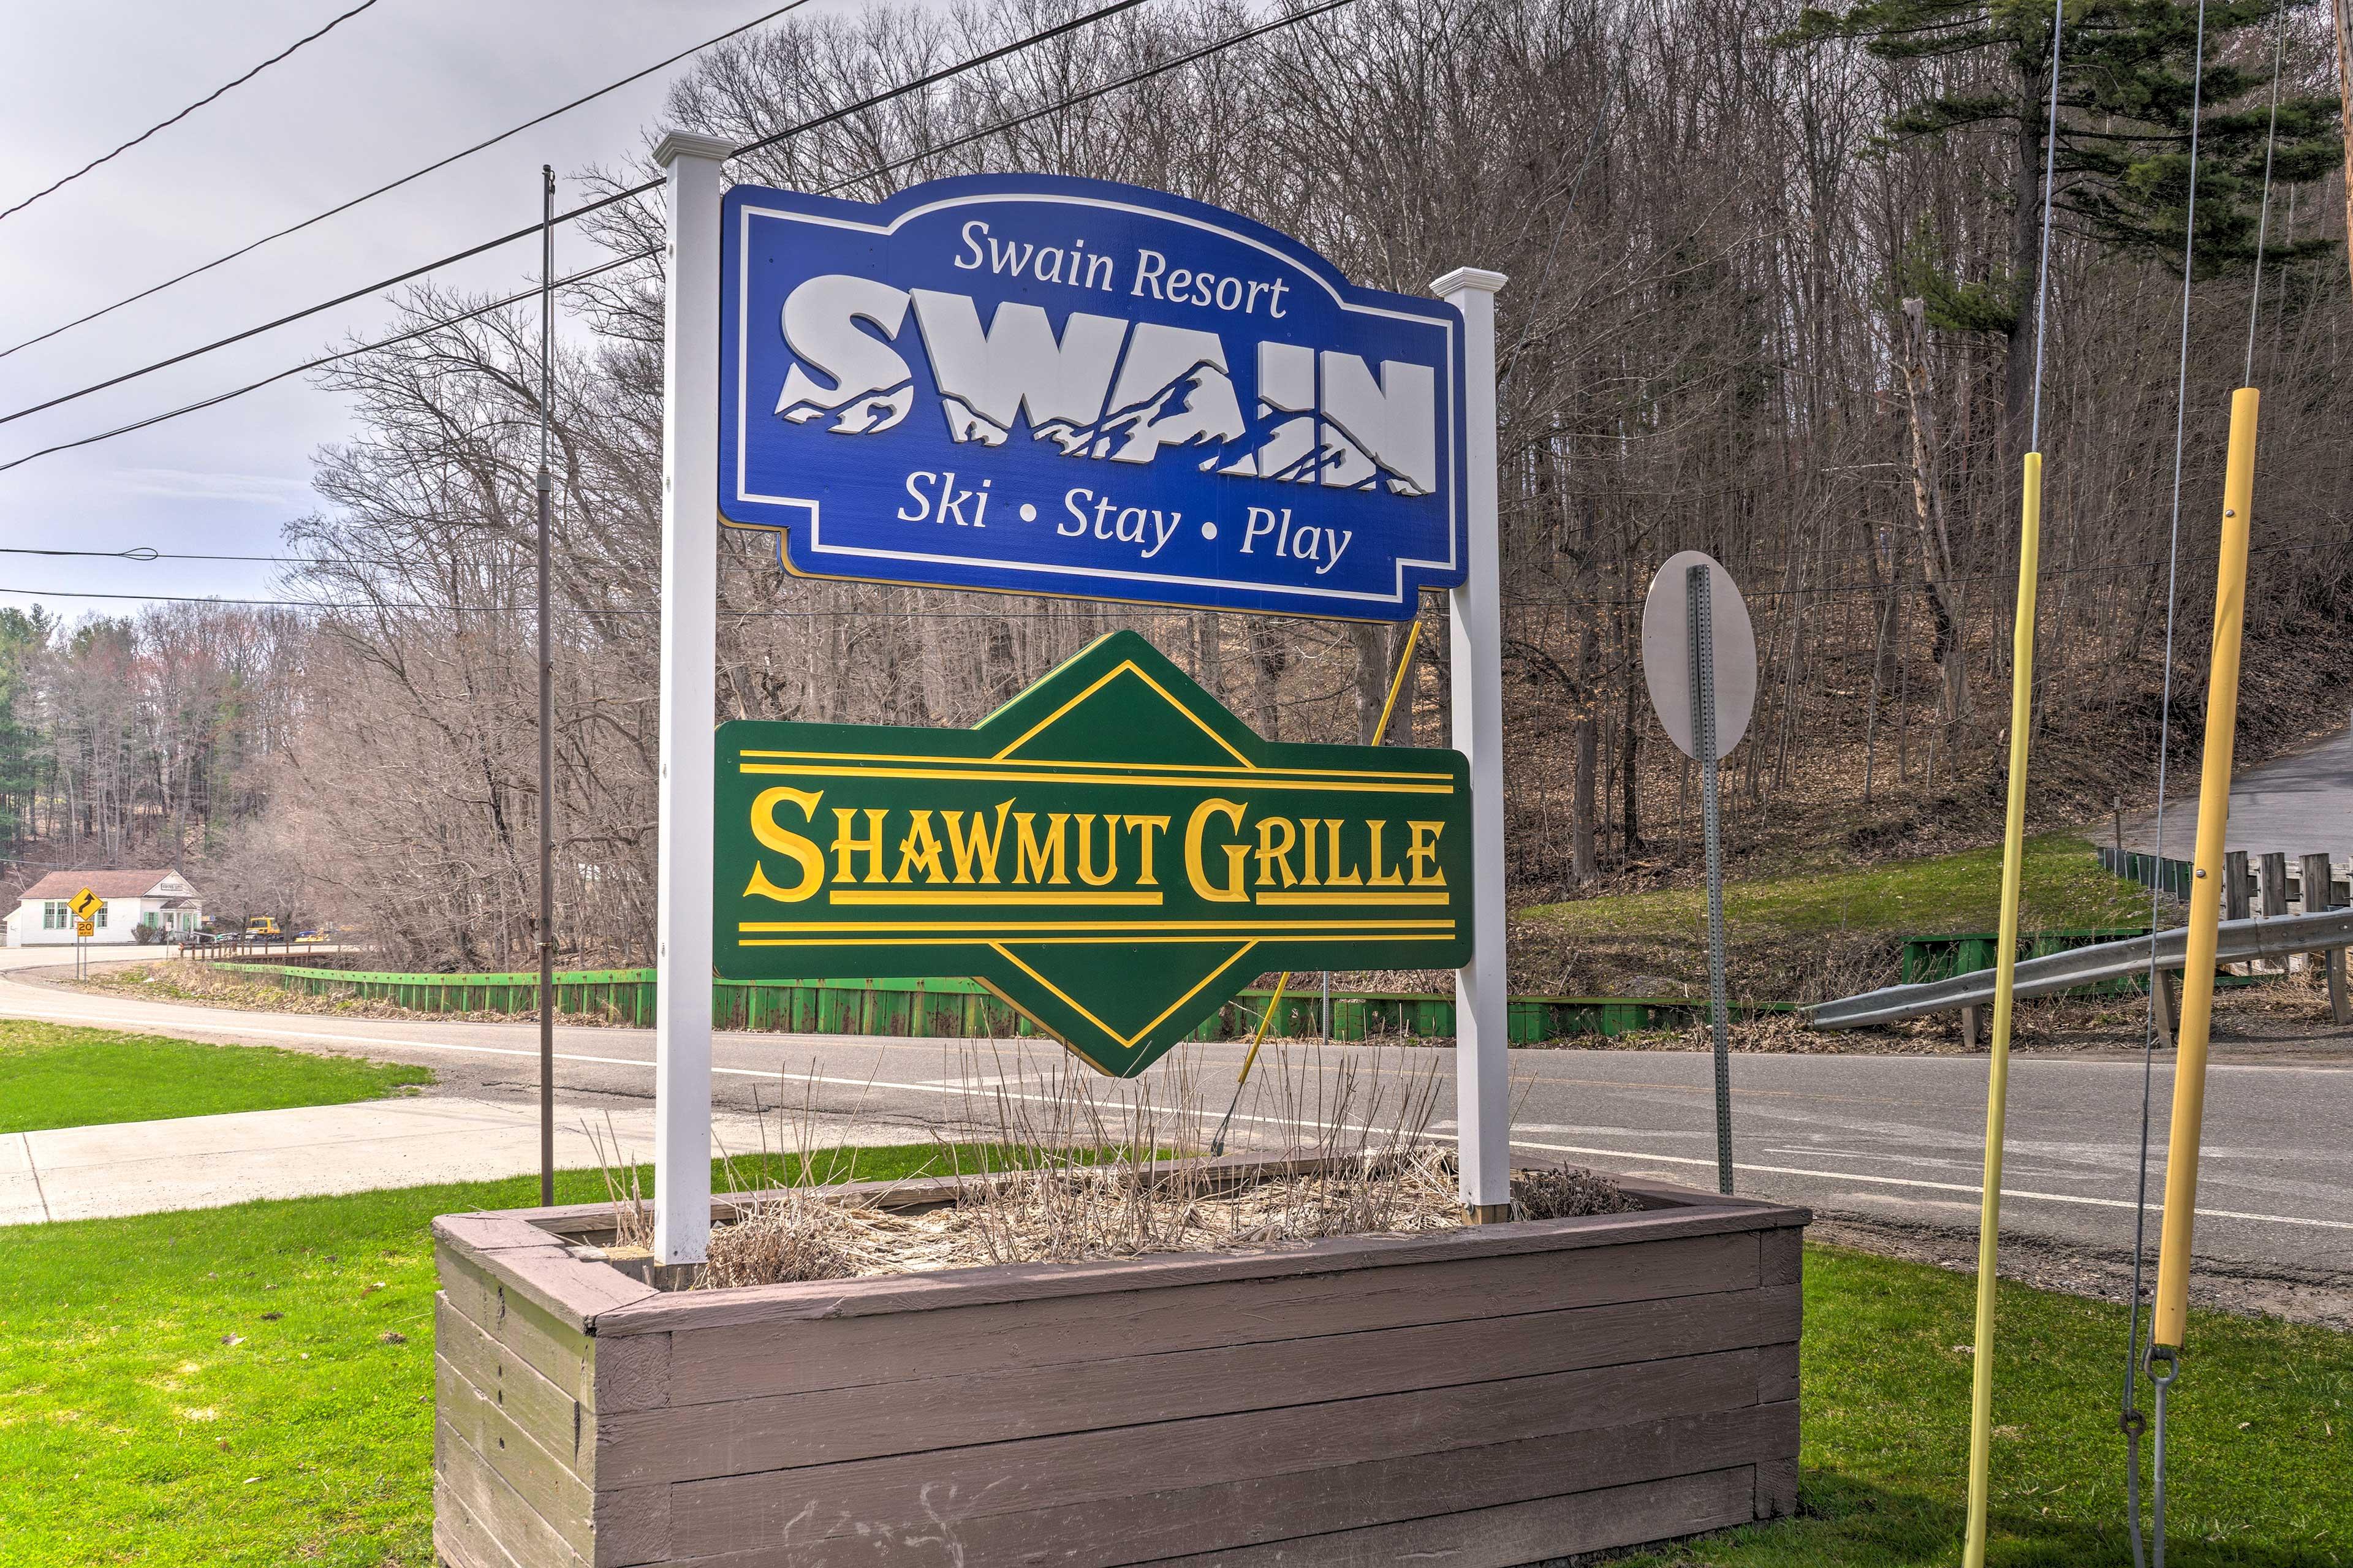 Swain Resort is just under 1 mile away!